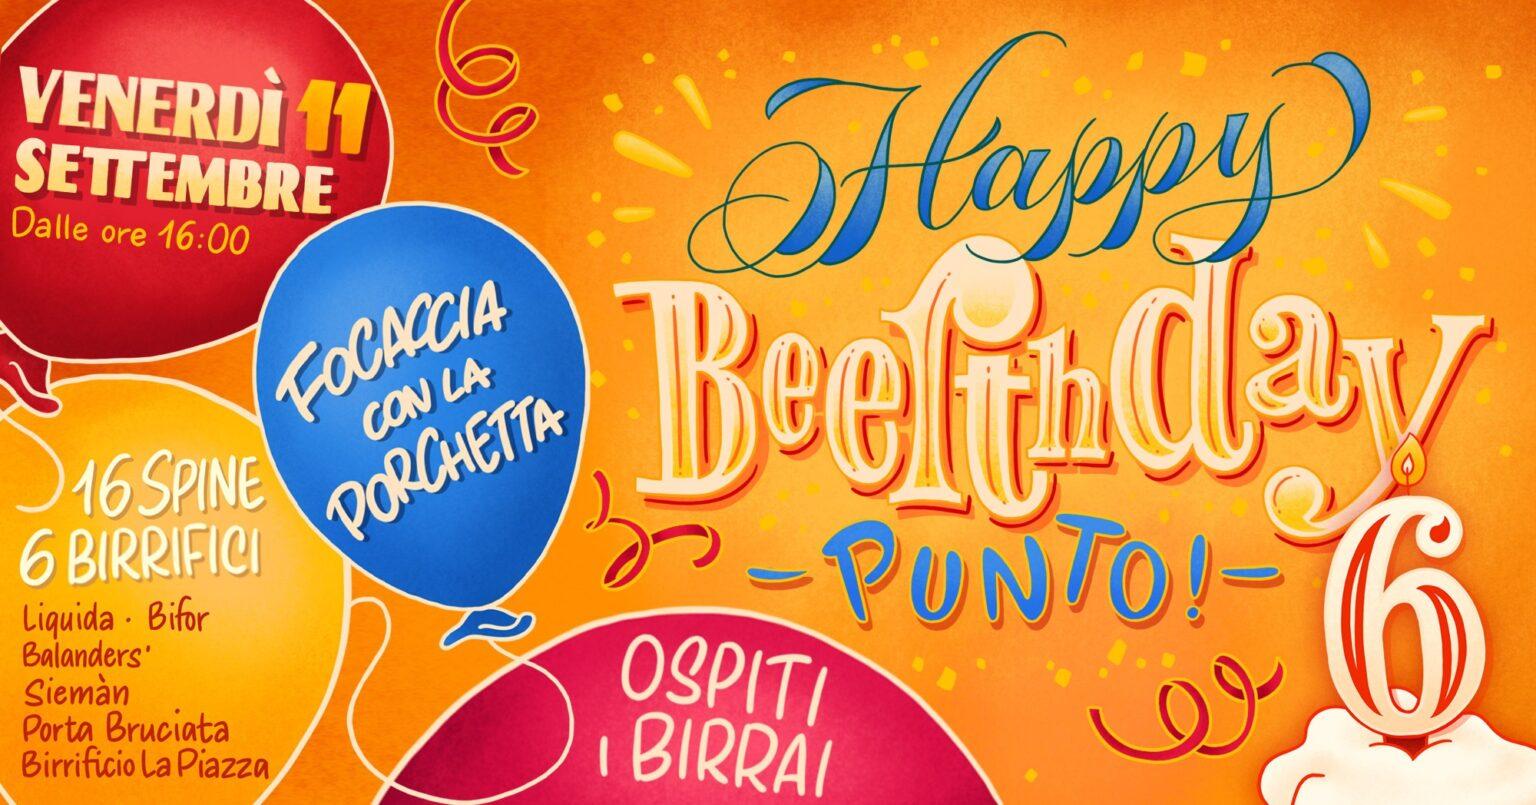 Domani festa Happy Beerthday Punto!